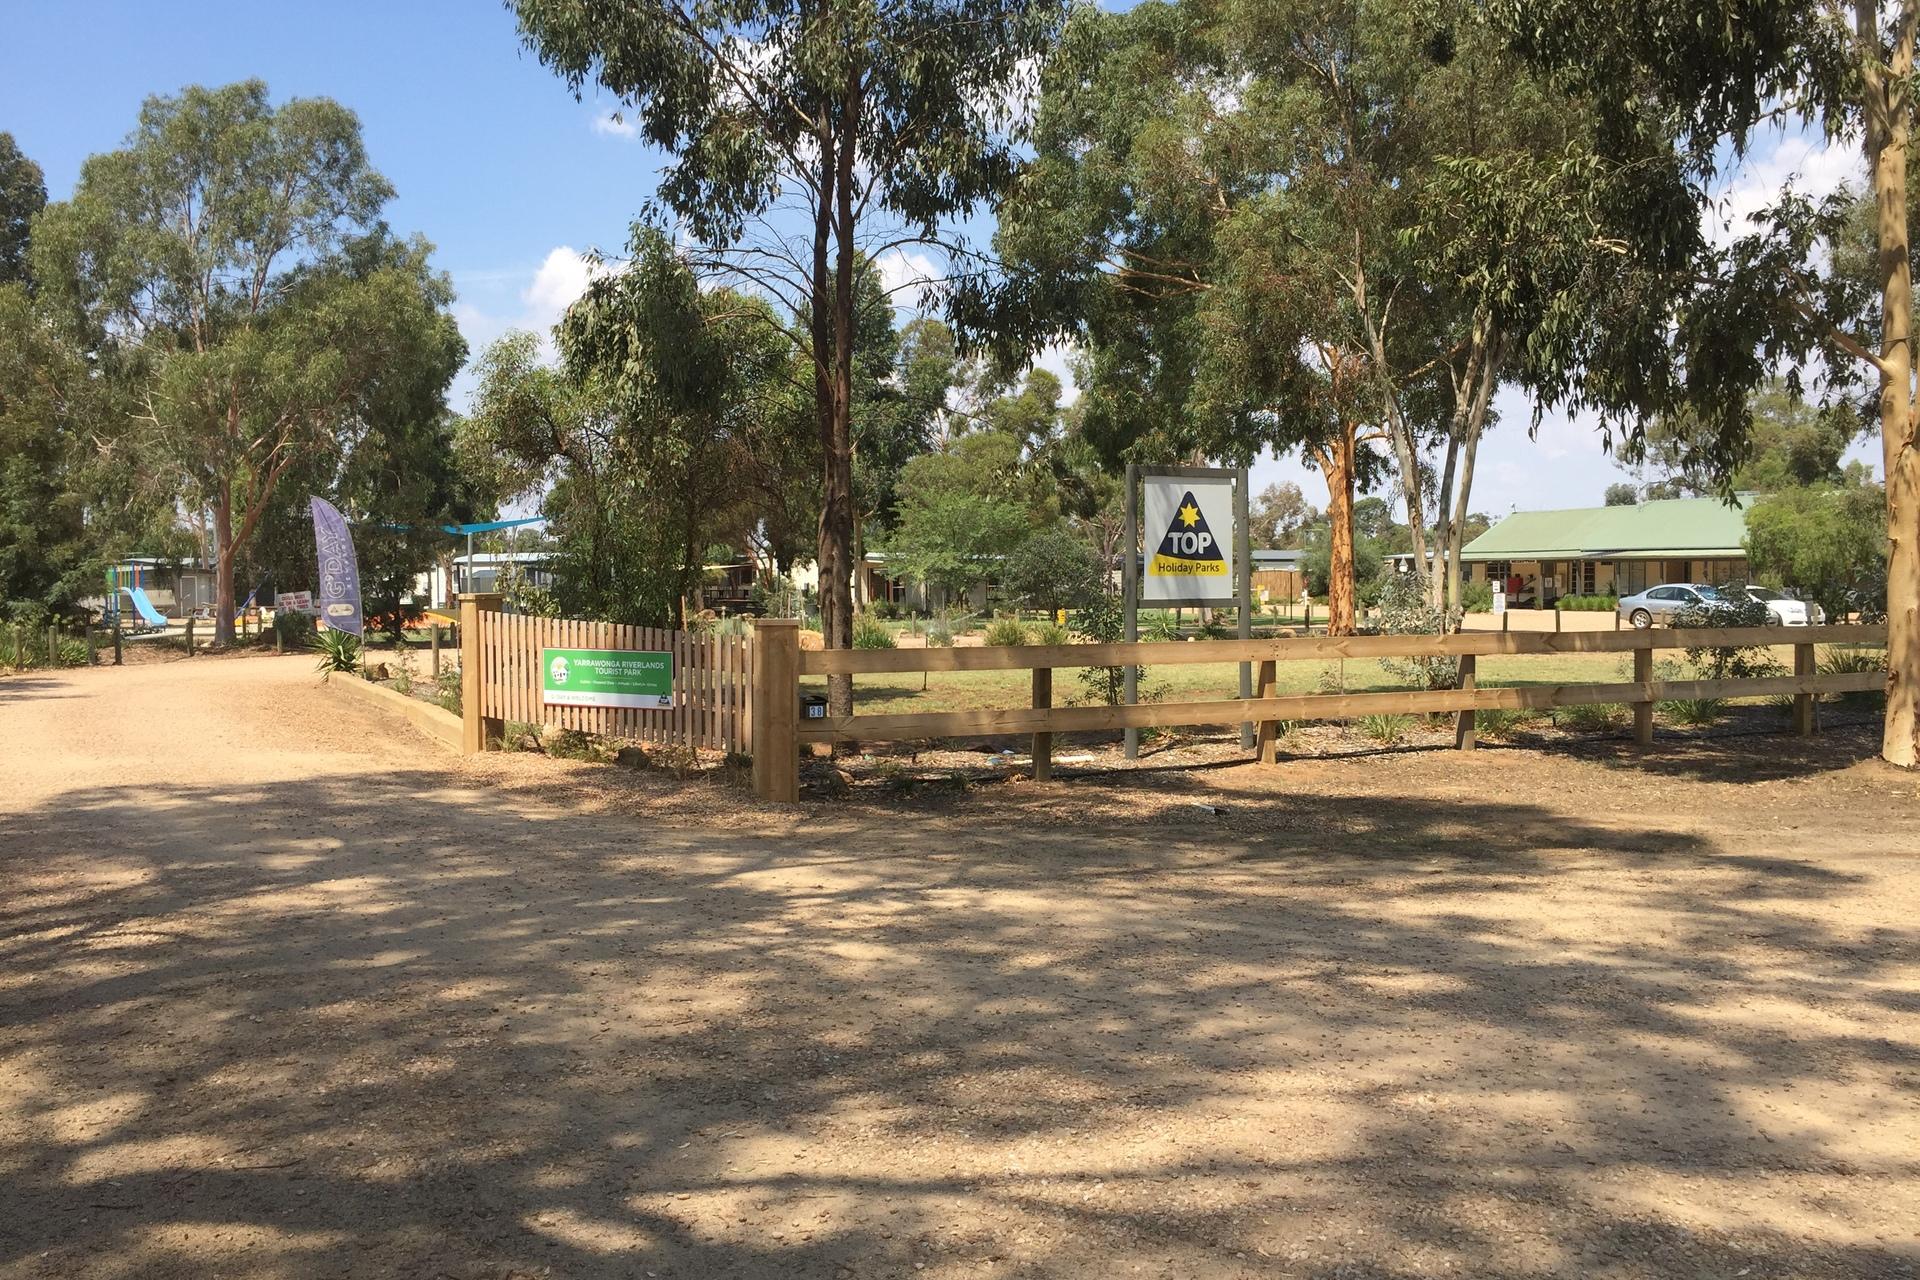 c - Yarrawonga Riverlands Tourist Park